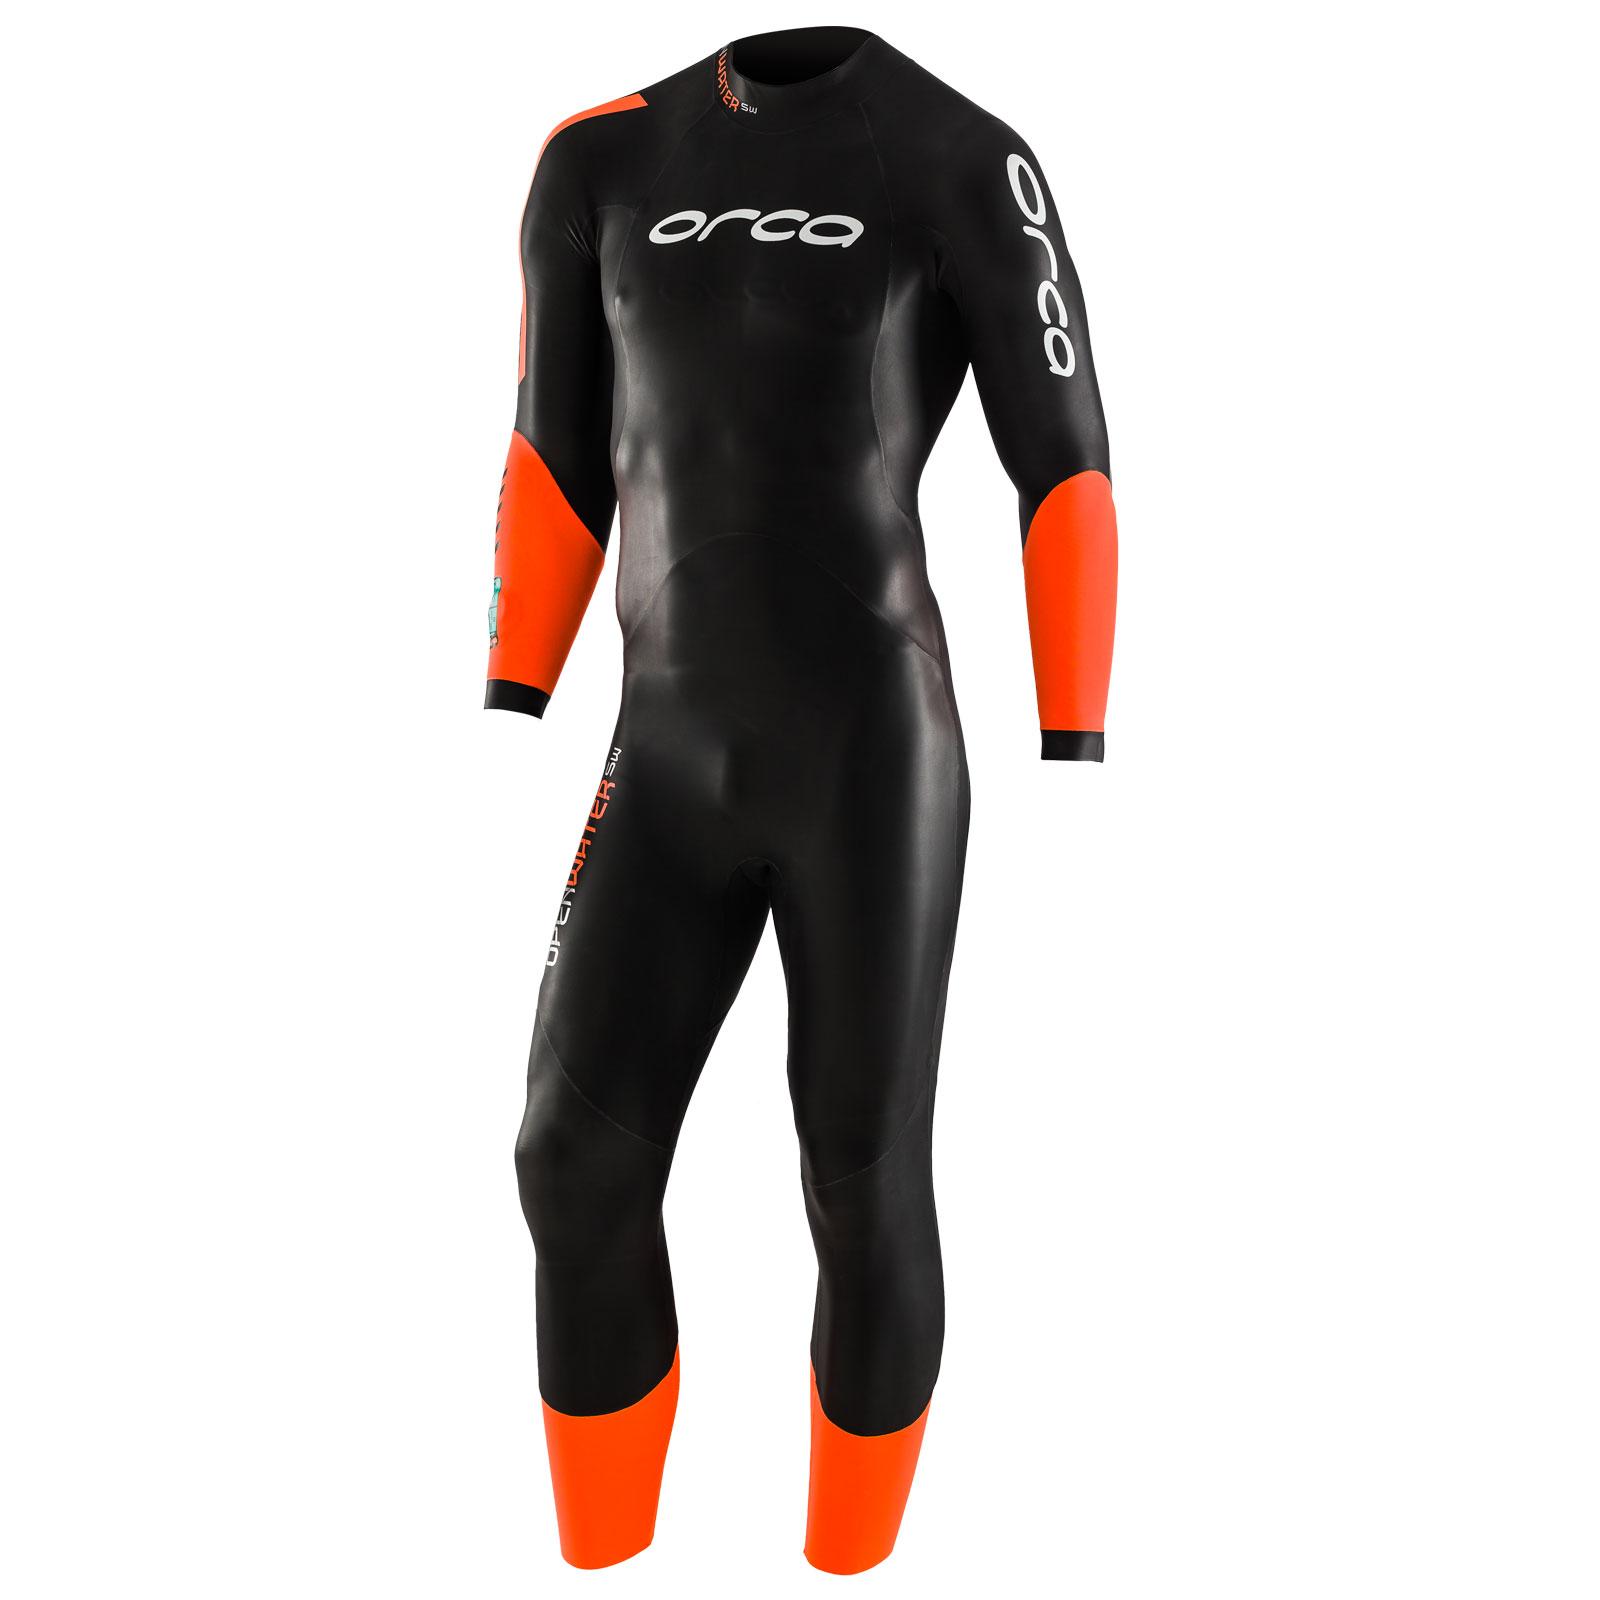 Orca Open Water SW Neoprenanzug - schwarz/orange